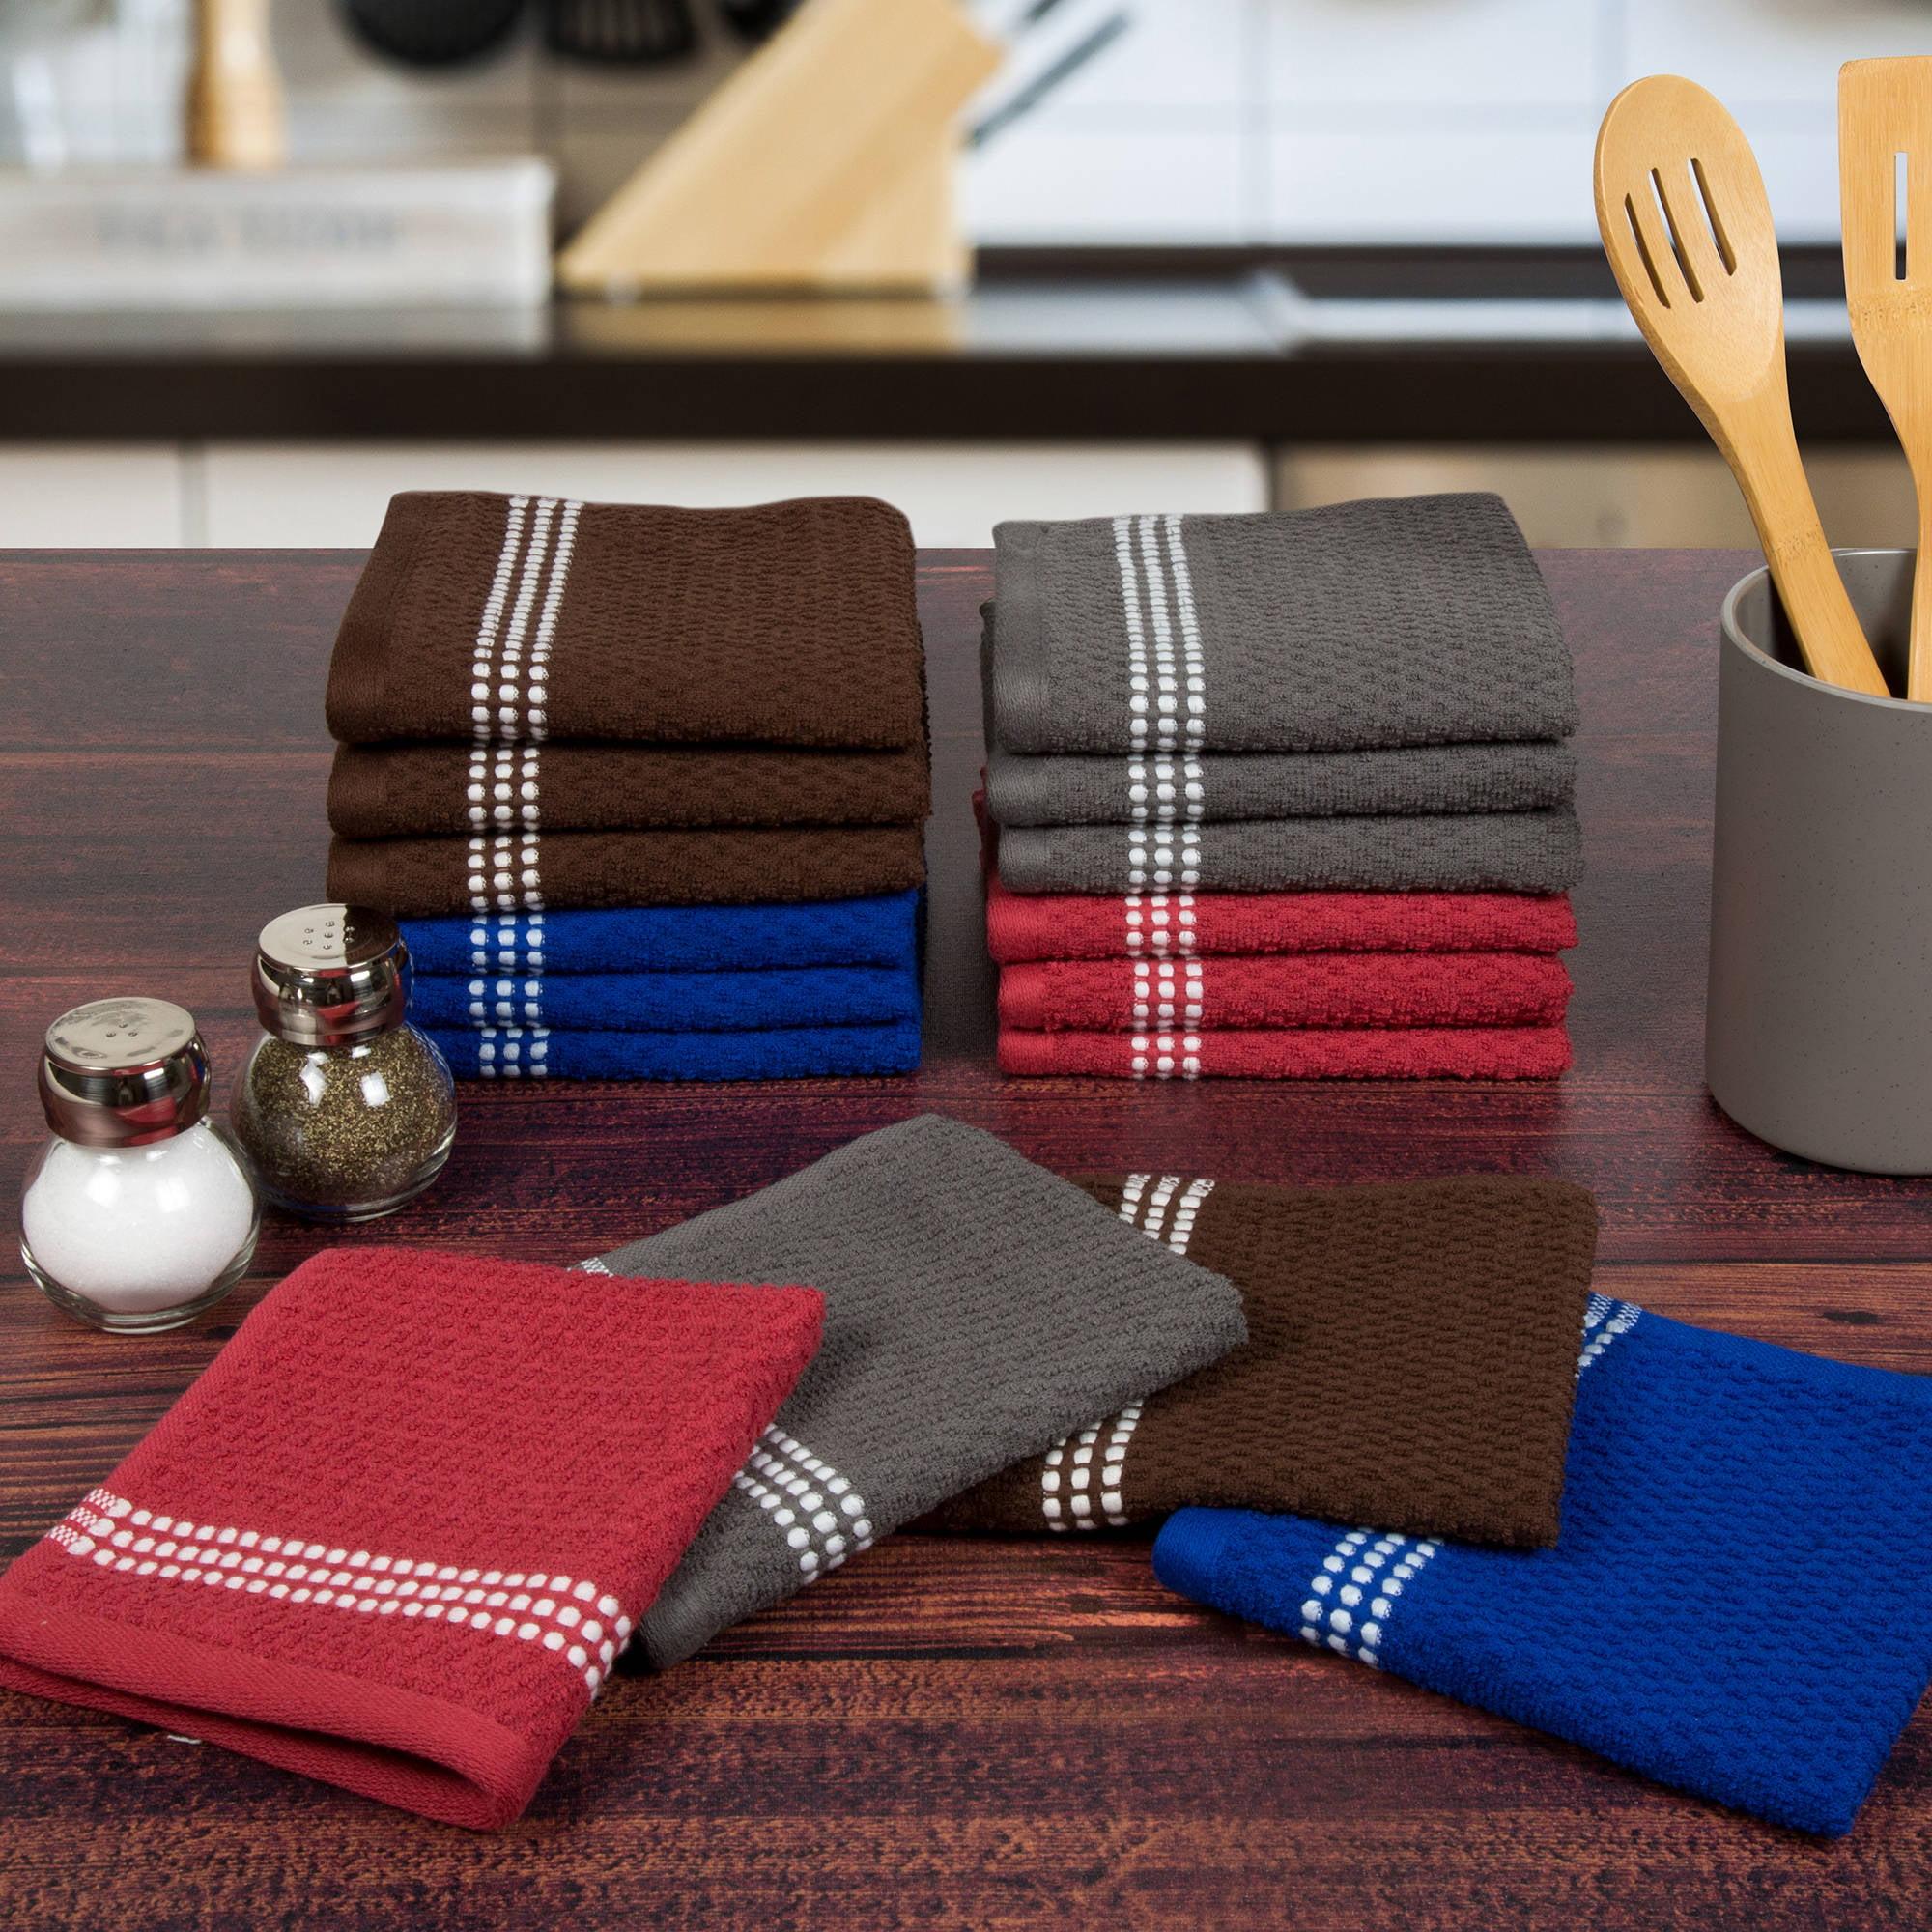 Somerset Home 16 Piece Cotton Popcorn Terry Kitchen Towel Washcloth Set by Trademark Global LLC